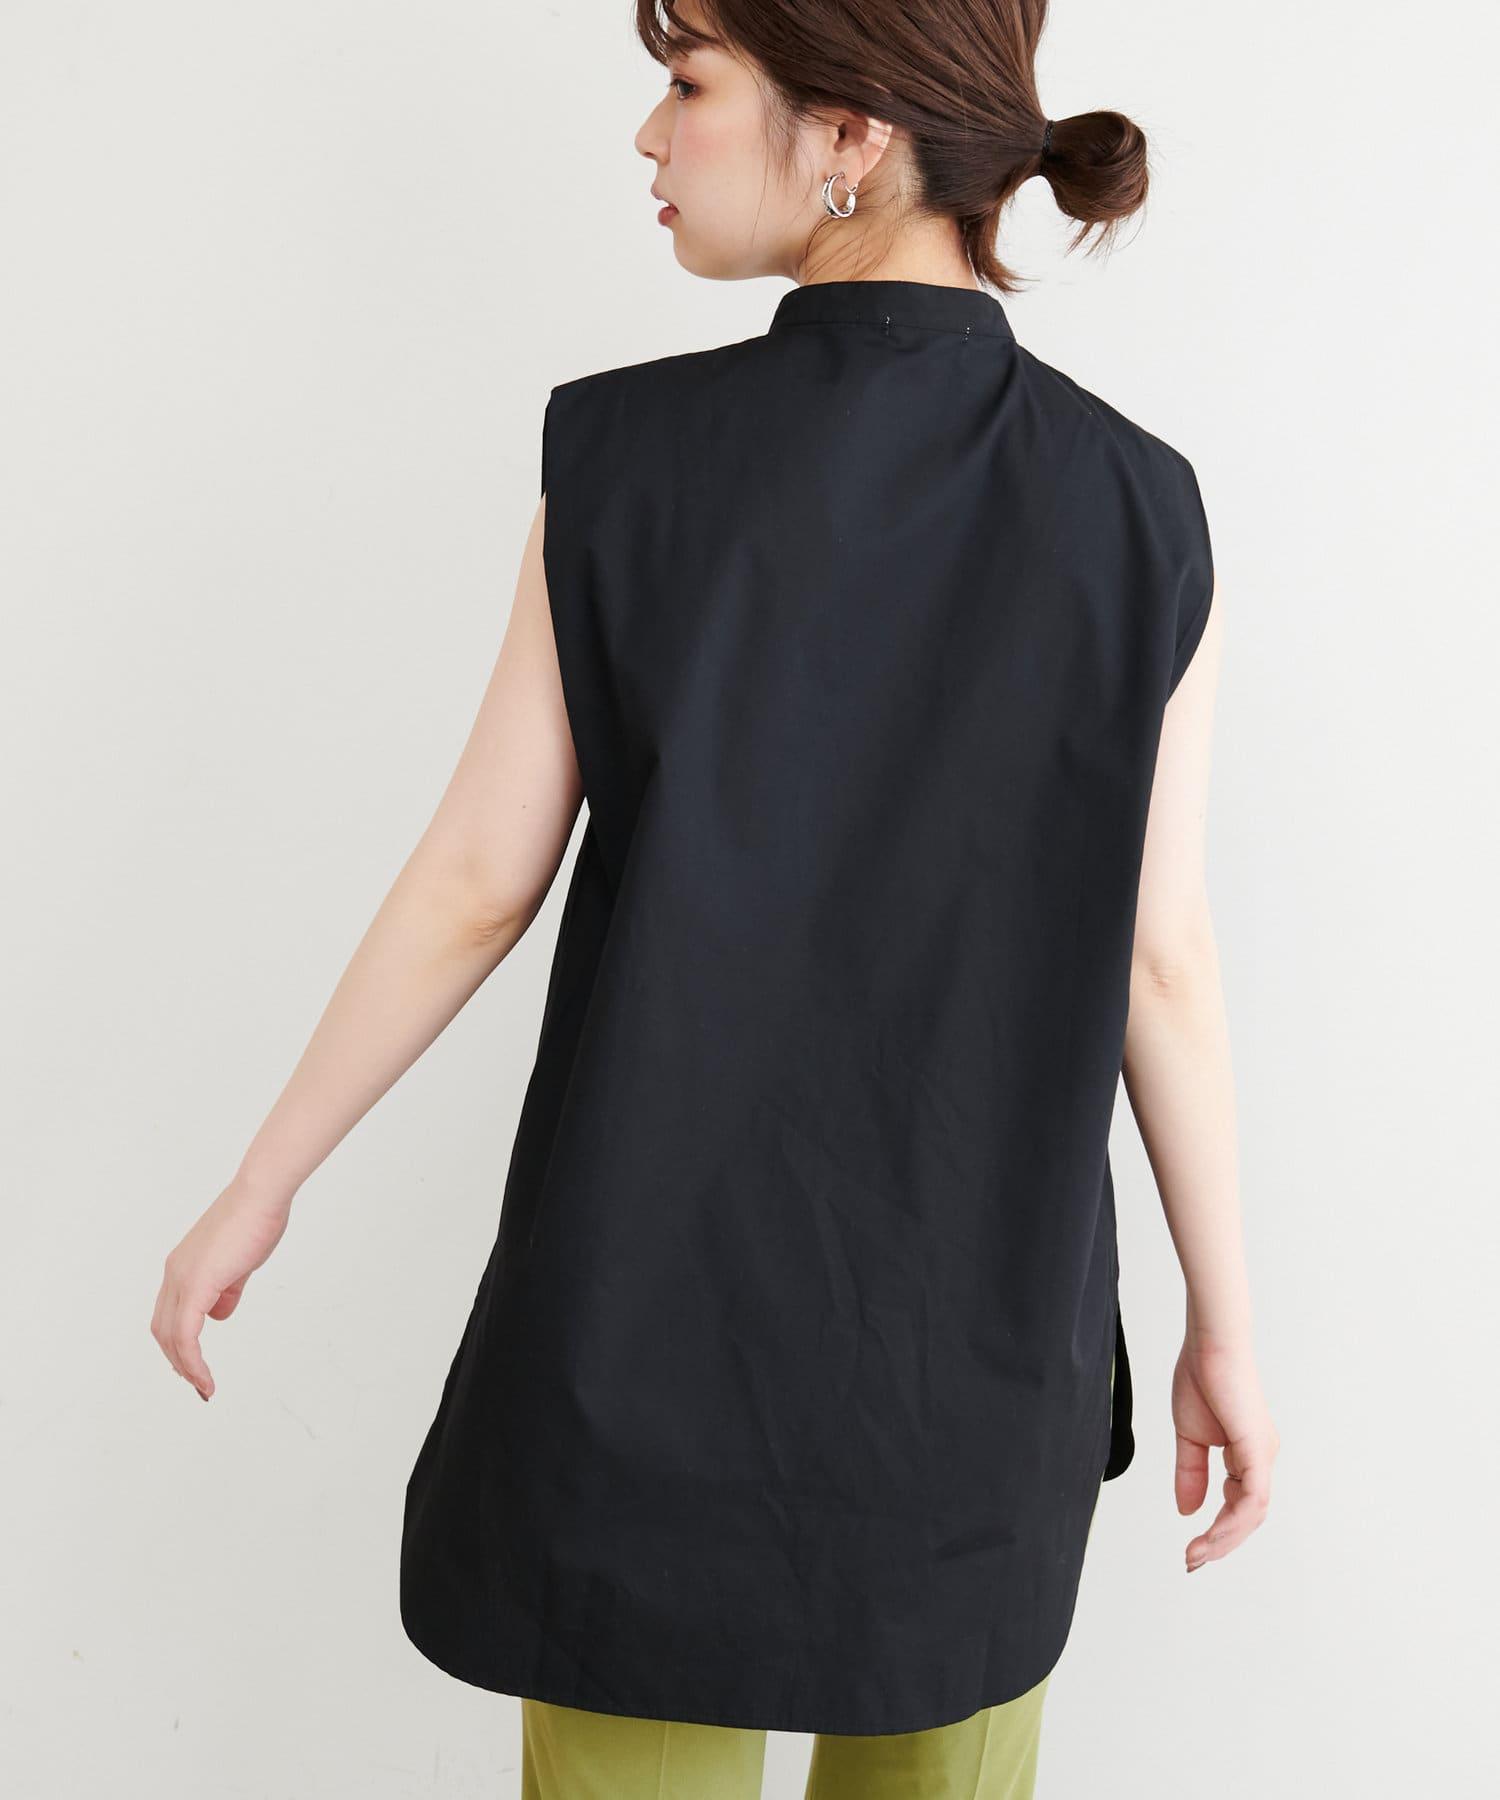 natural couture(ナチュラルクチュール) ピンタックノースリブラウス